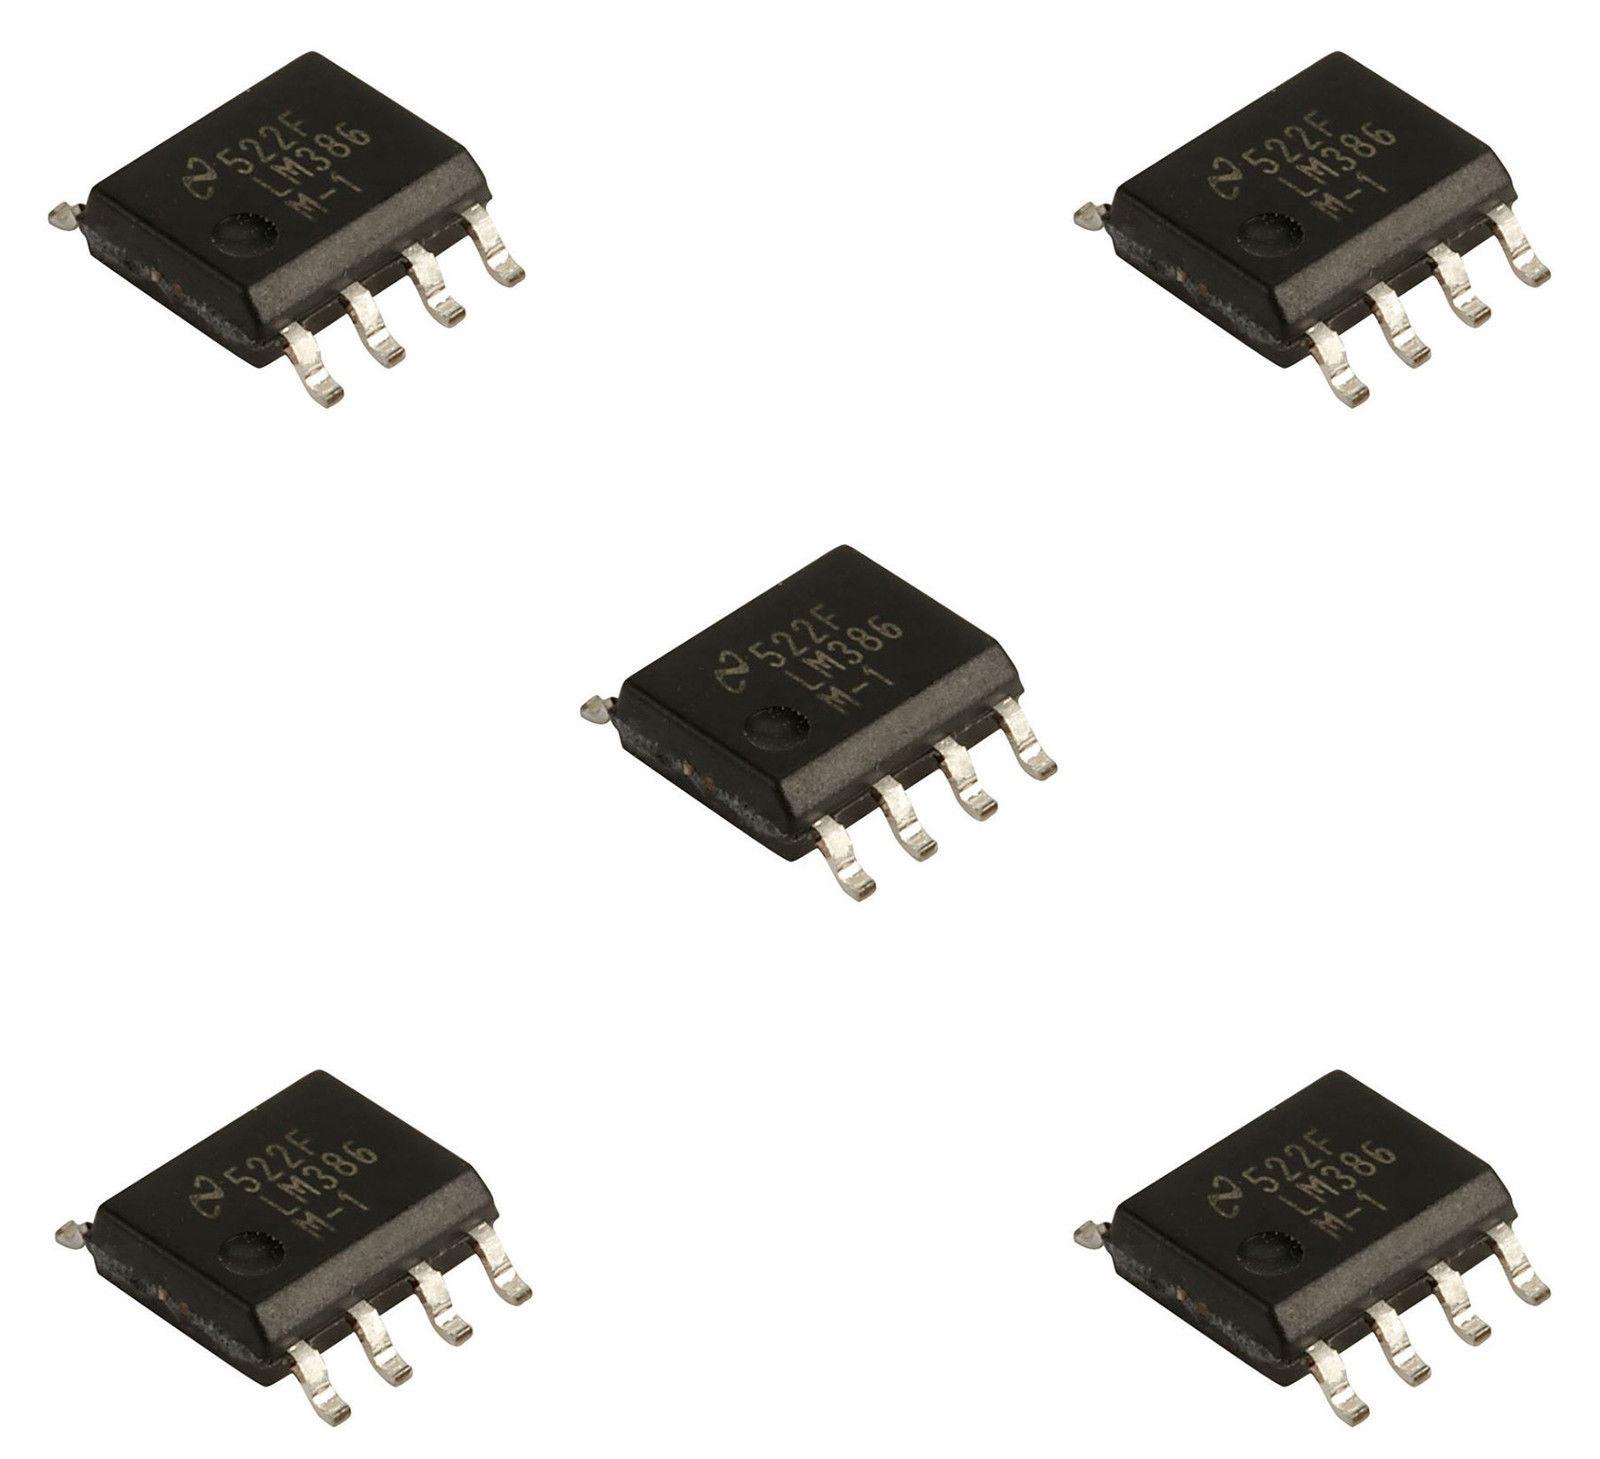 5 X Lm386m Sop 8 Low Voltage Audio Power Amplifier All Top Notch Circuit Diagram Using Lm386